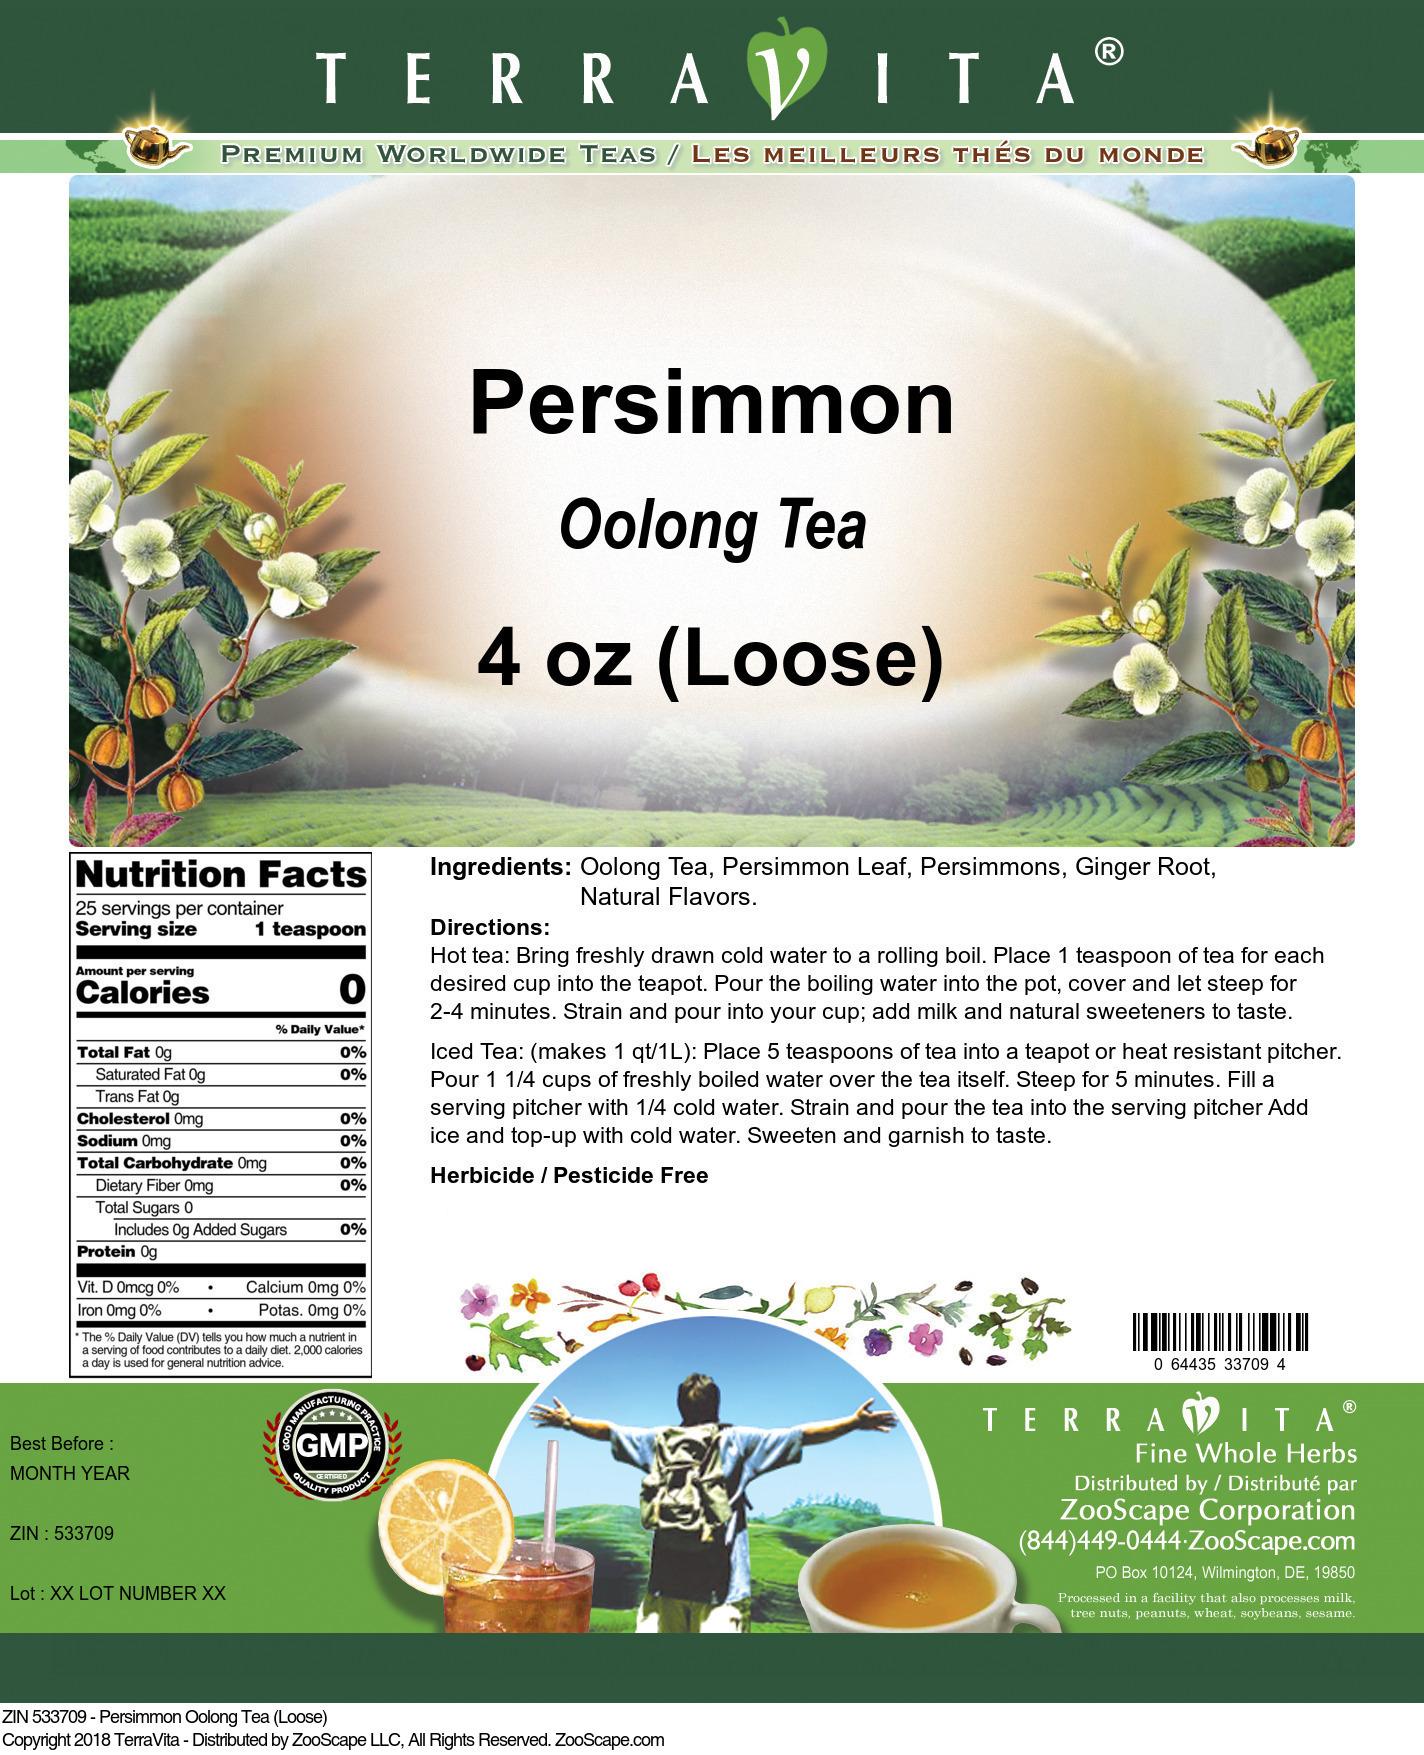 Persimmon Oolong Tea (Loose)